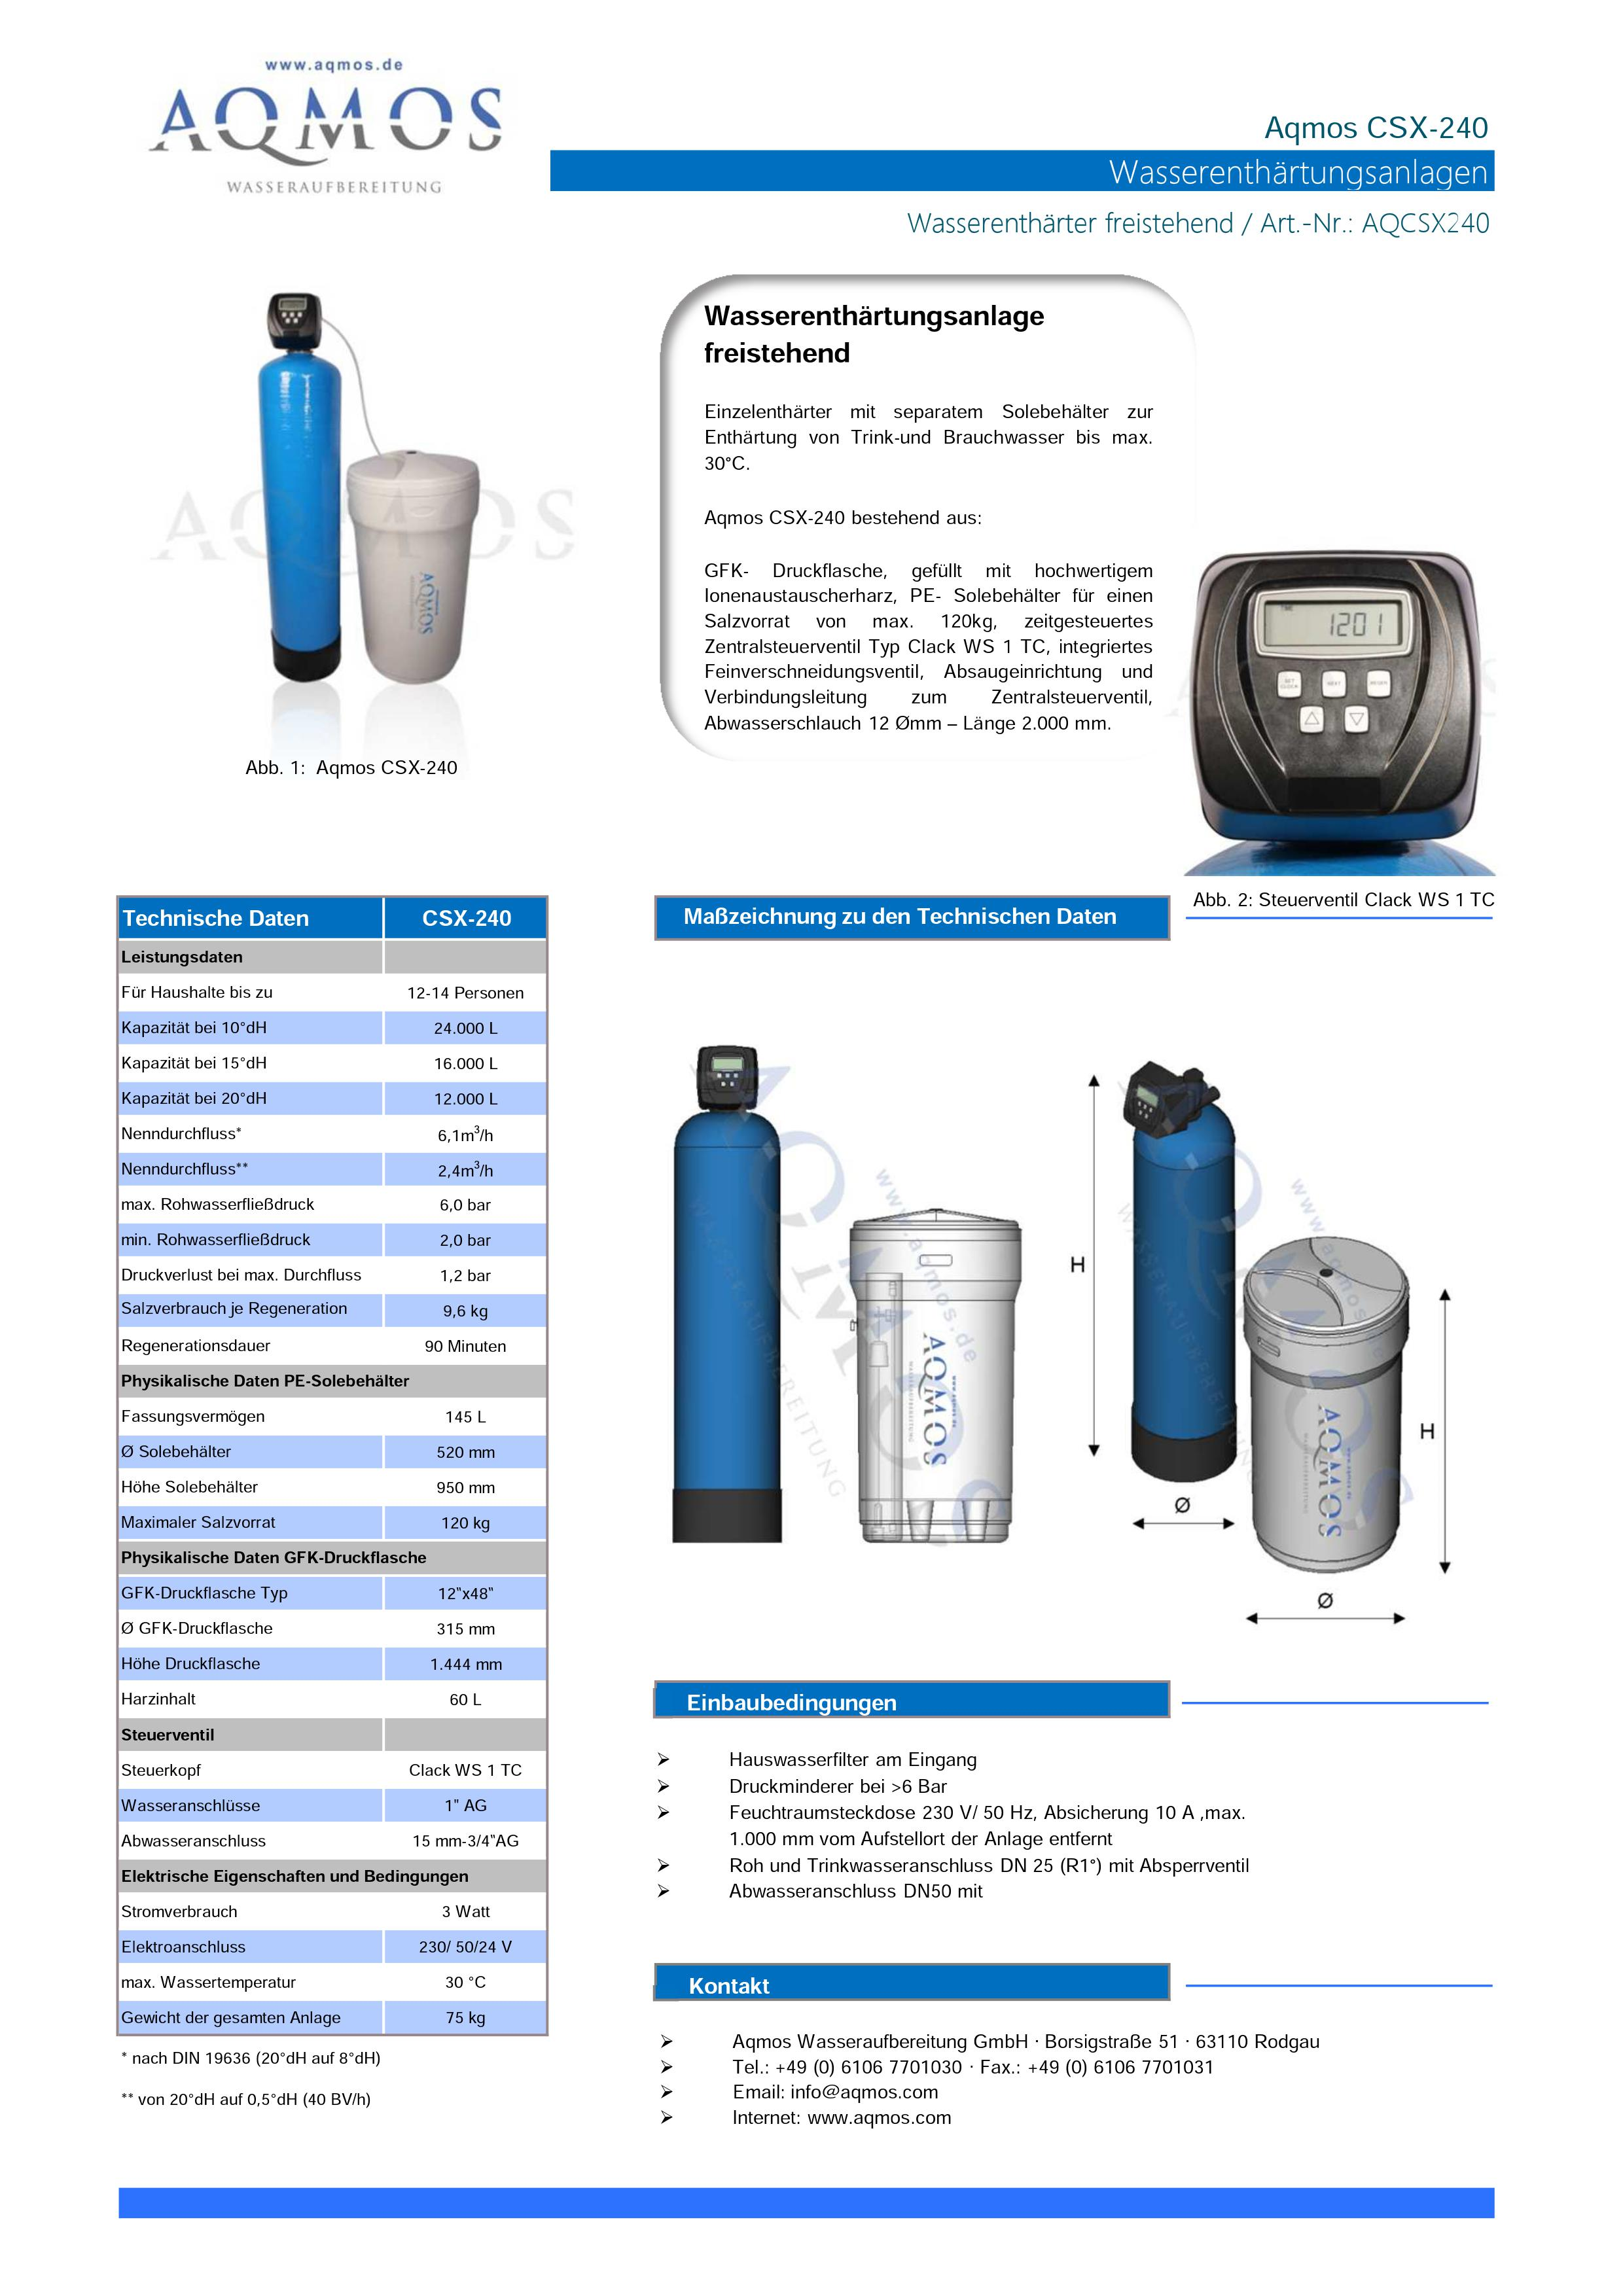 CSX-240-Datenblatt